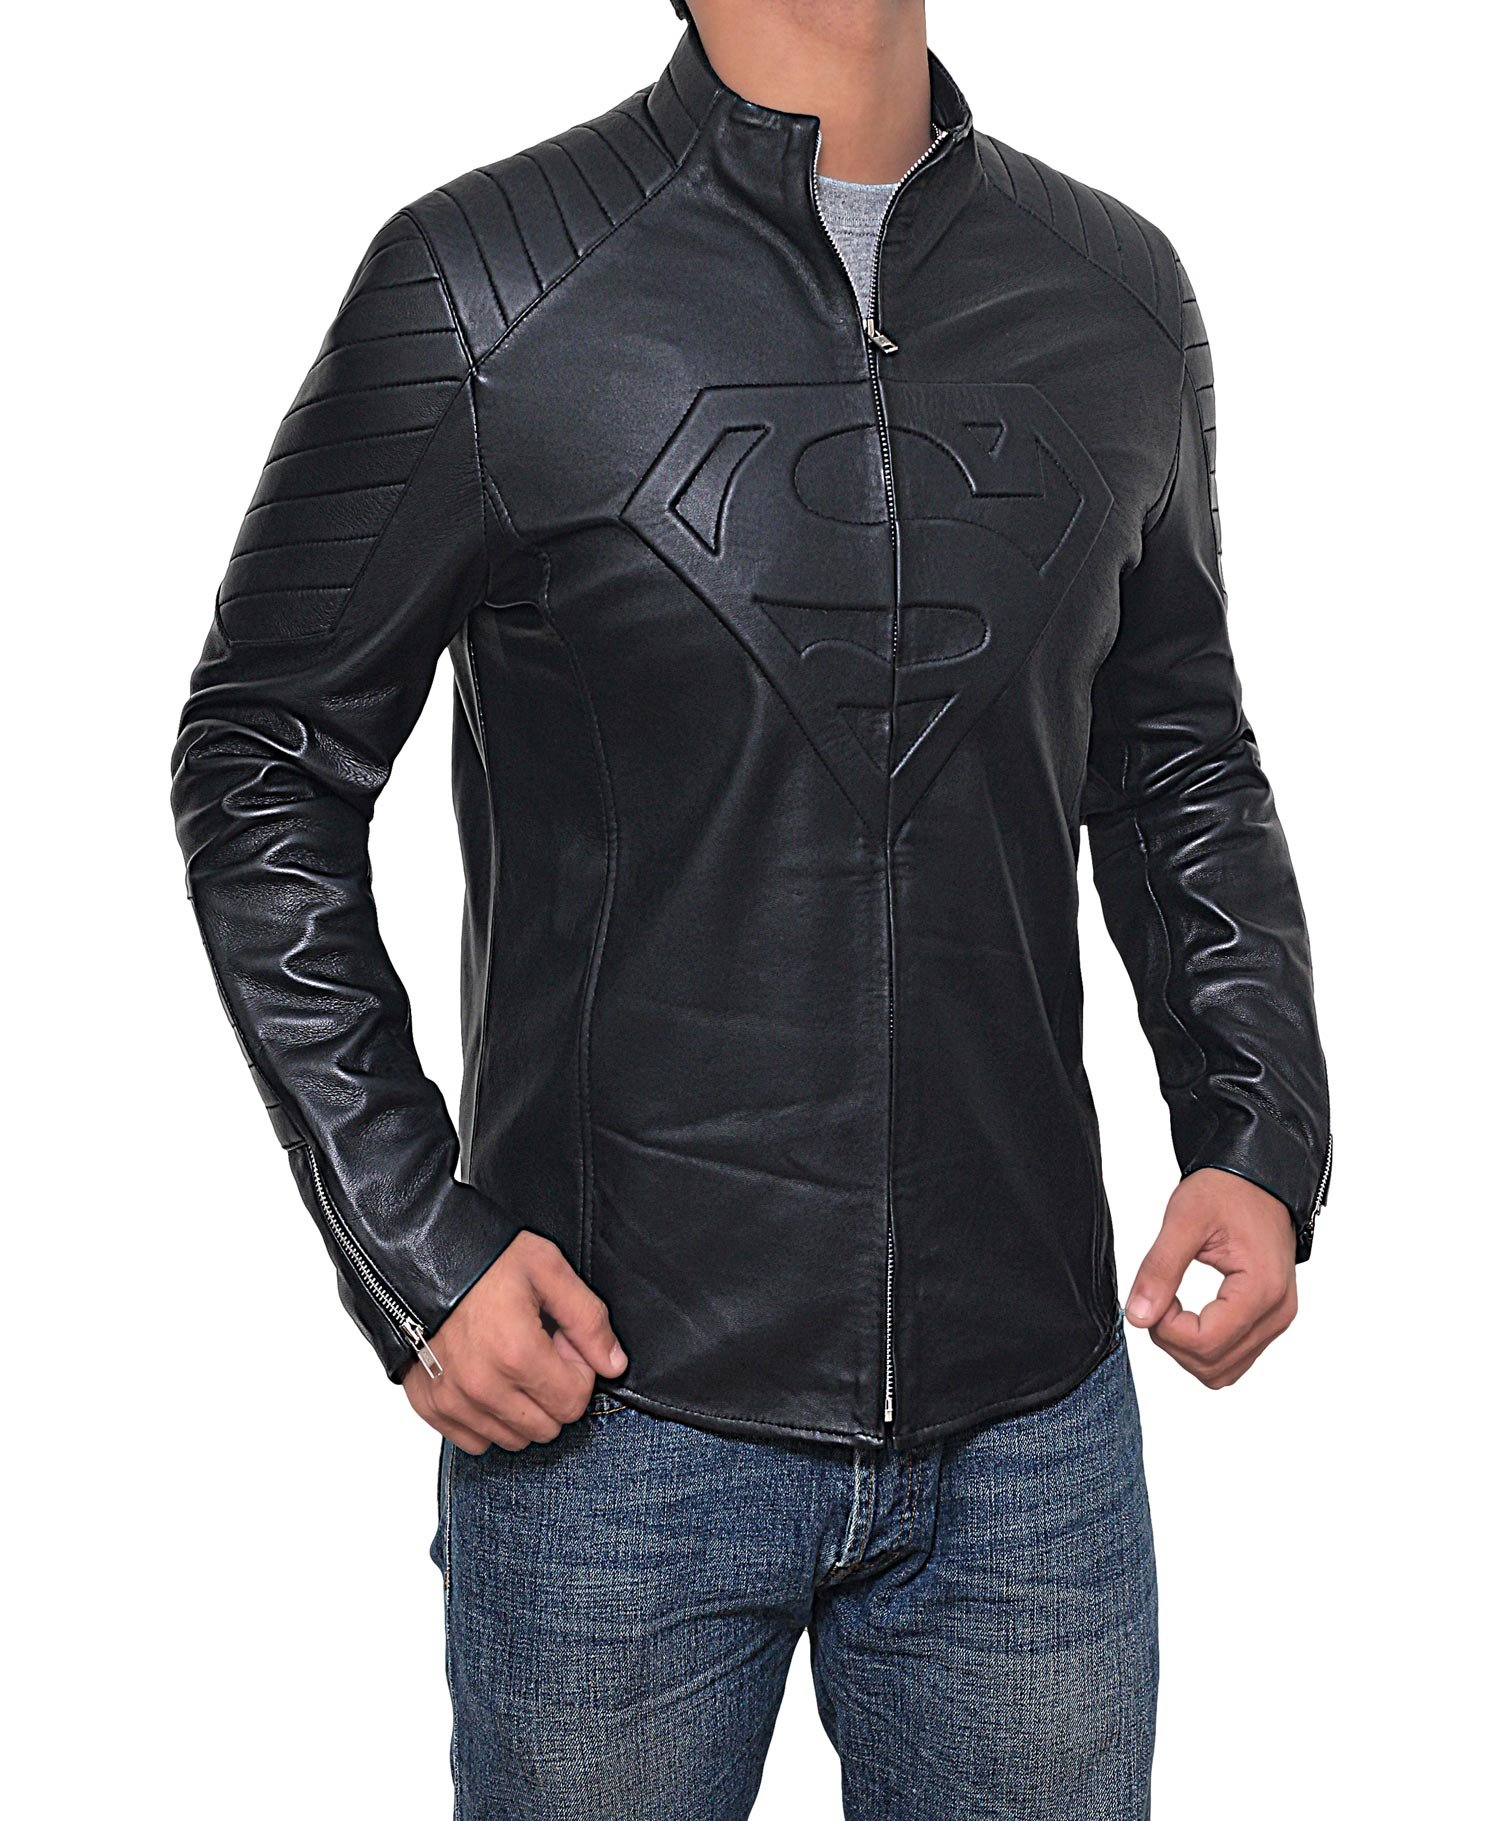 Mens Black Superman Leather Slim Fit Jacket (Superman Jacket, XL) by Decrum (Image #2)